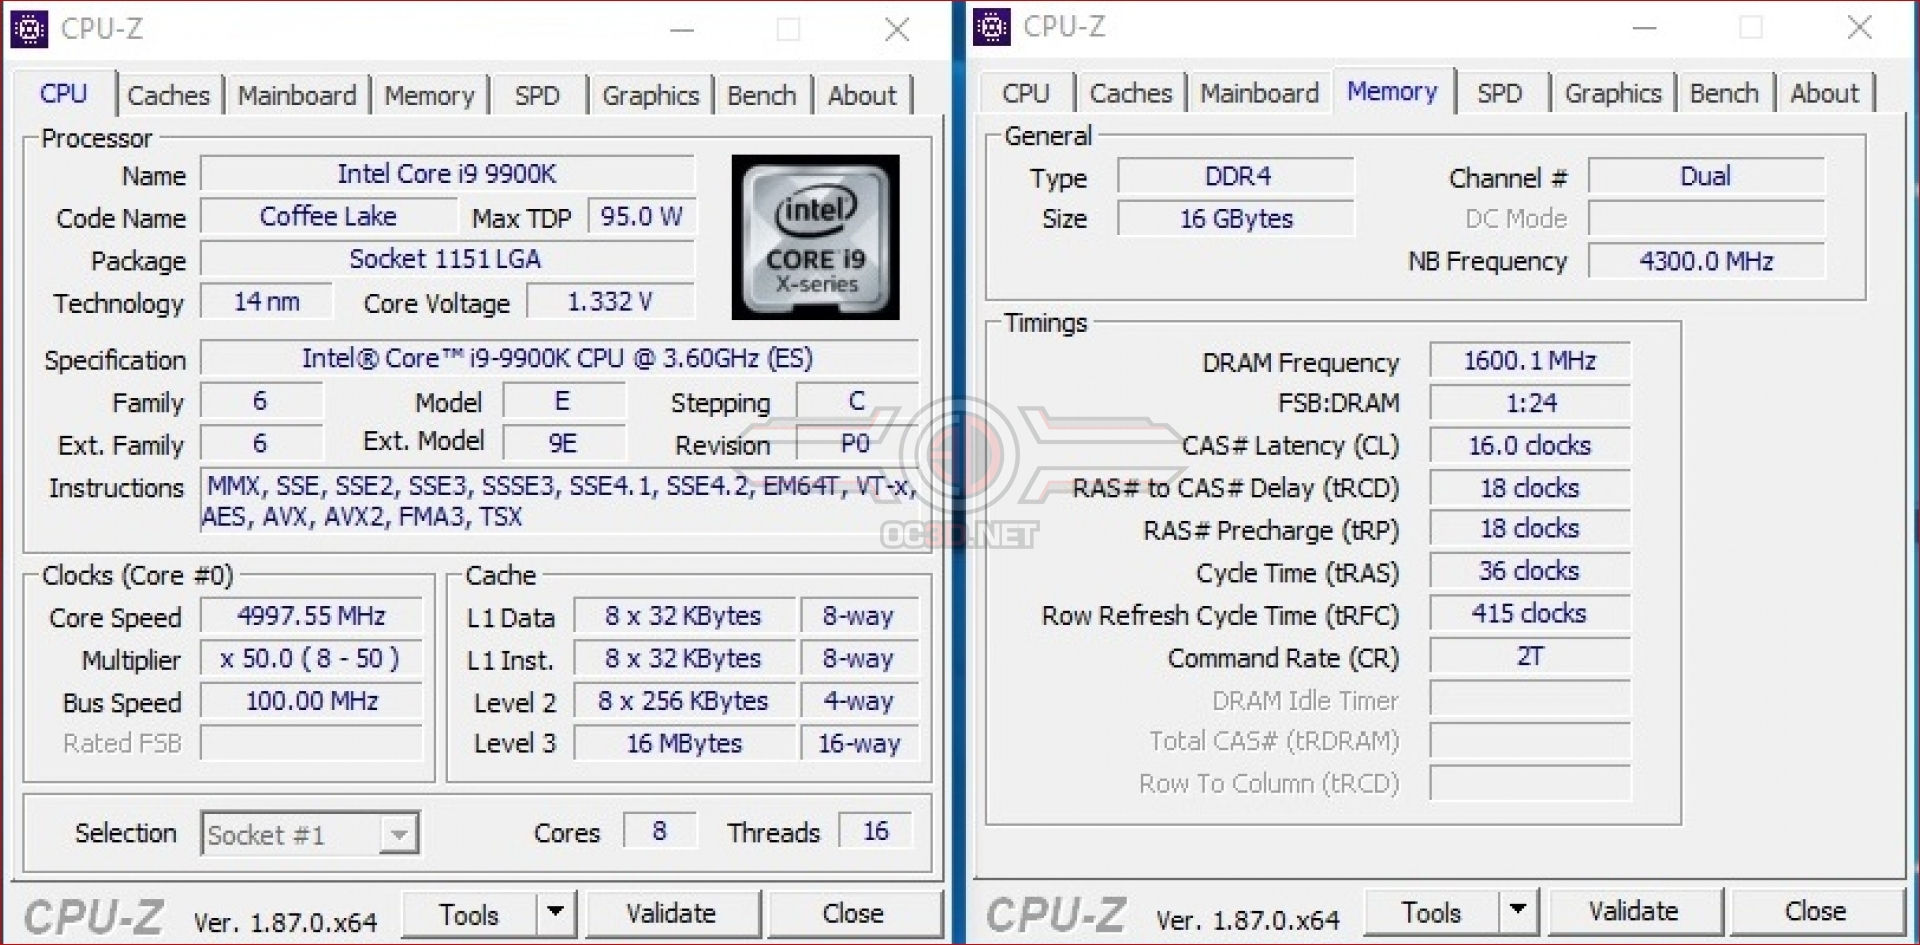 Gigabyte Z390 Aorus Pro Review | Test Setup and Overclocking